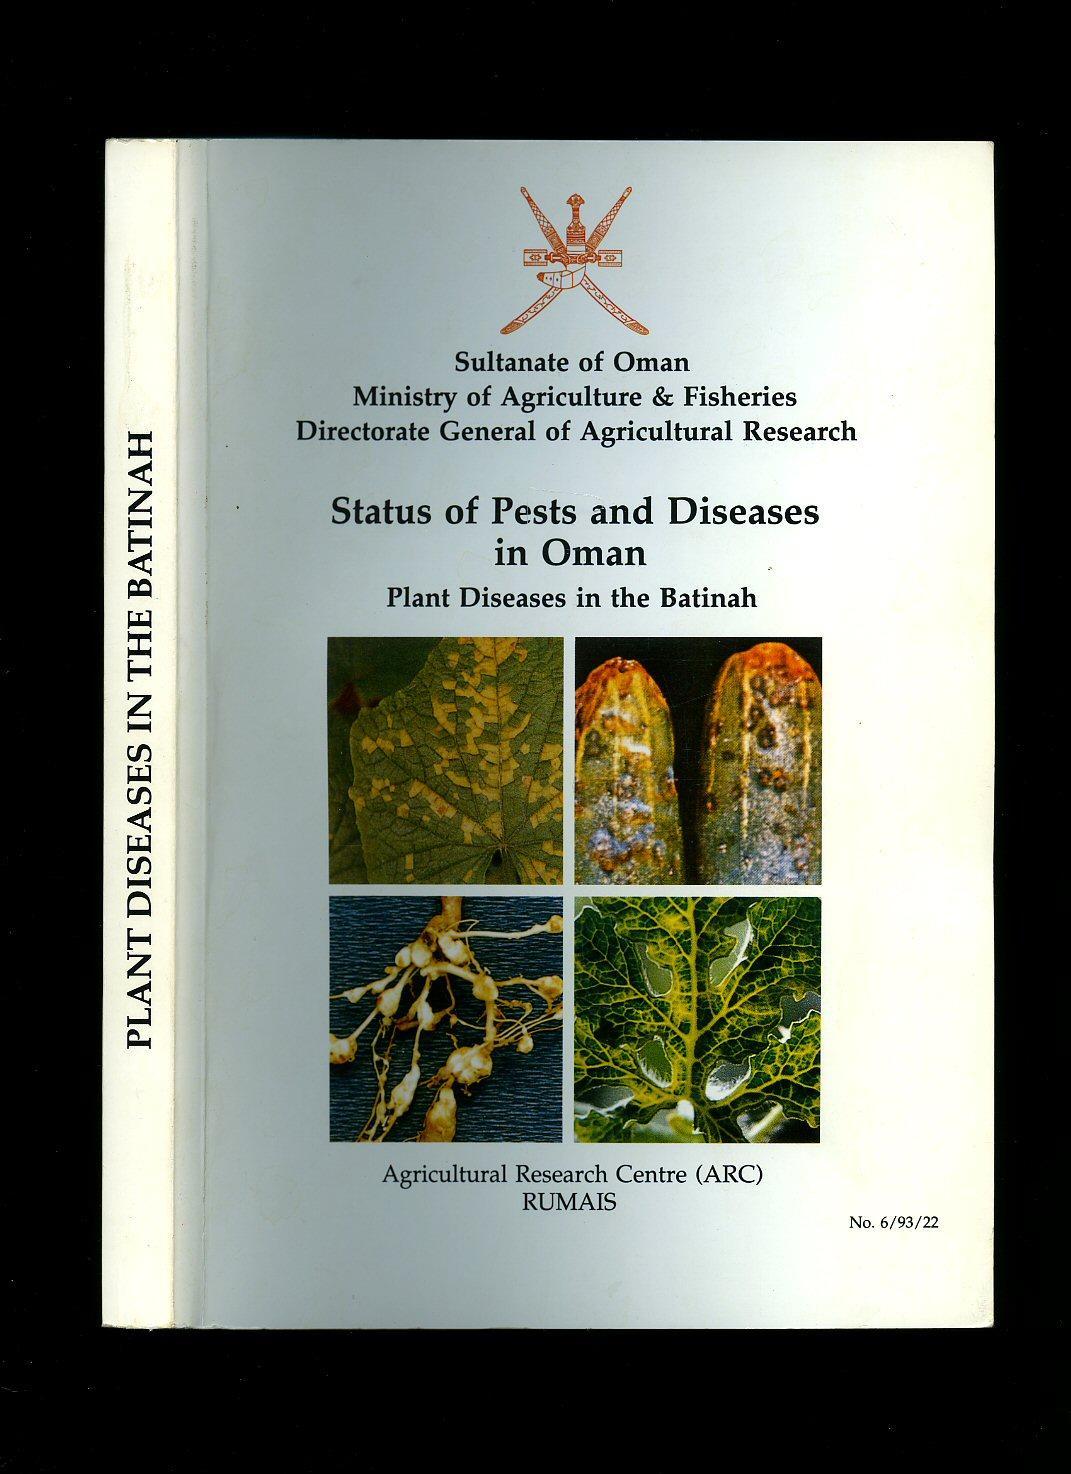 Status of Pests and Diseases in Oman